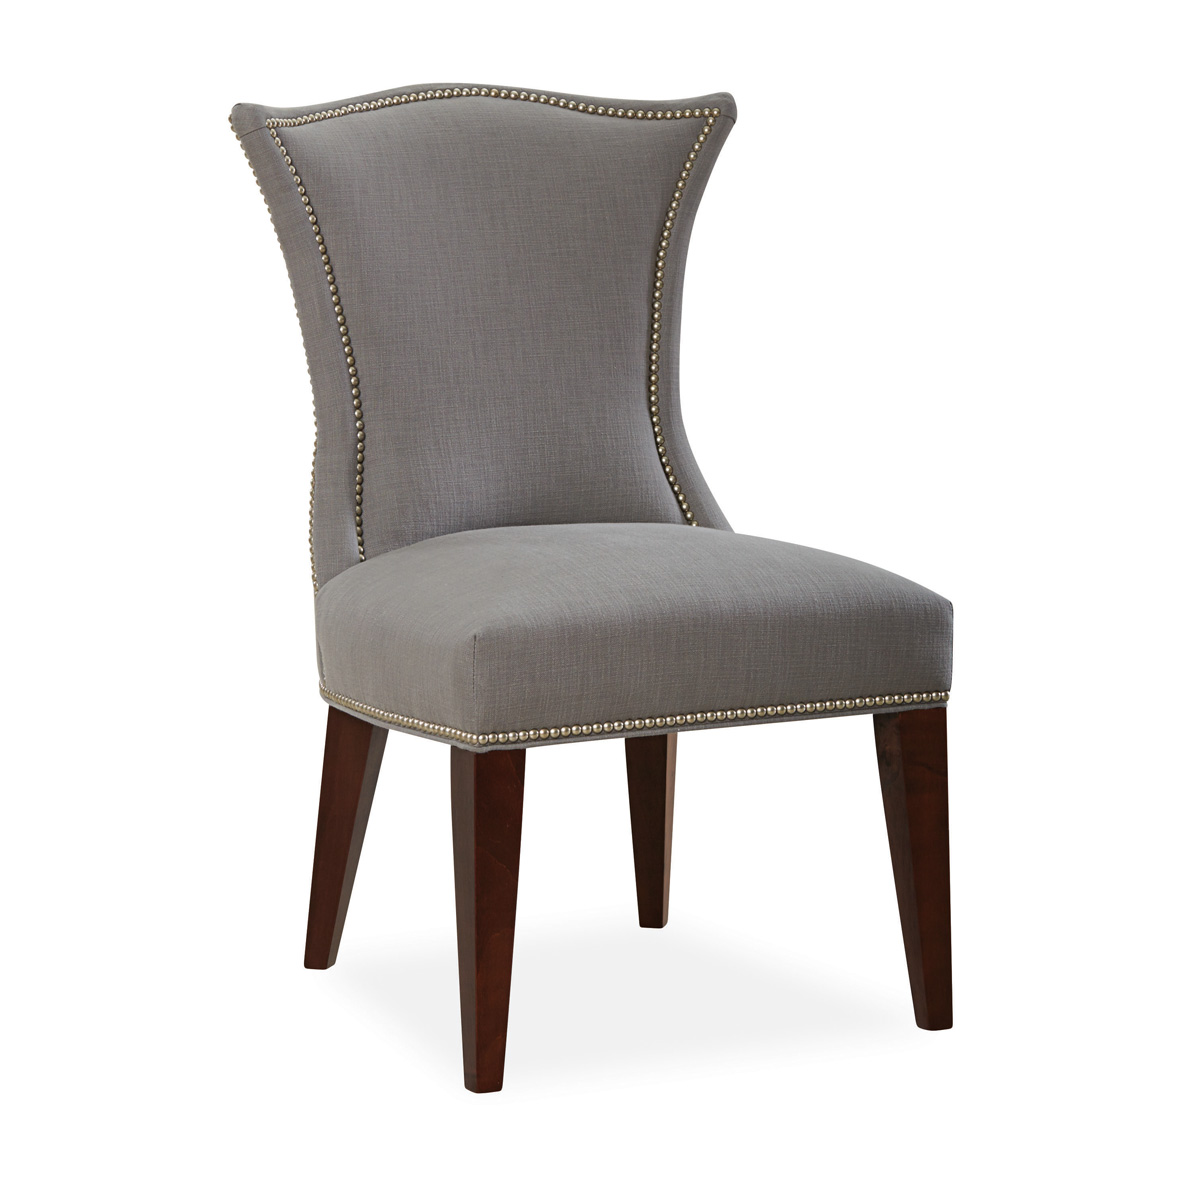 Dining_Chair_1297-01_upholstered_Lee_Industries.jpg